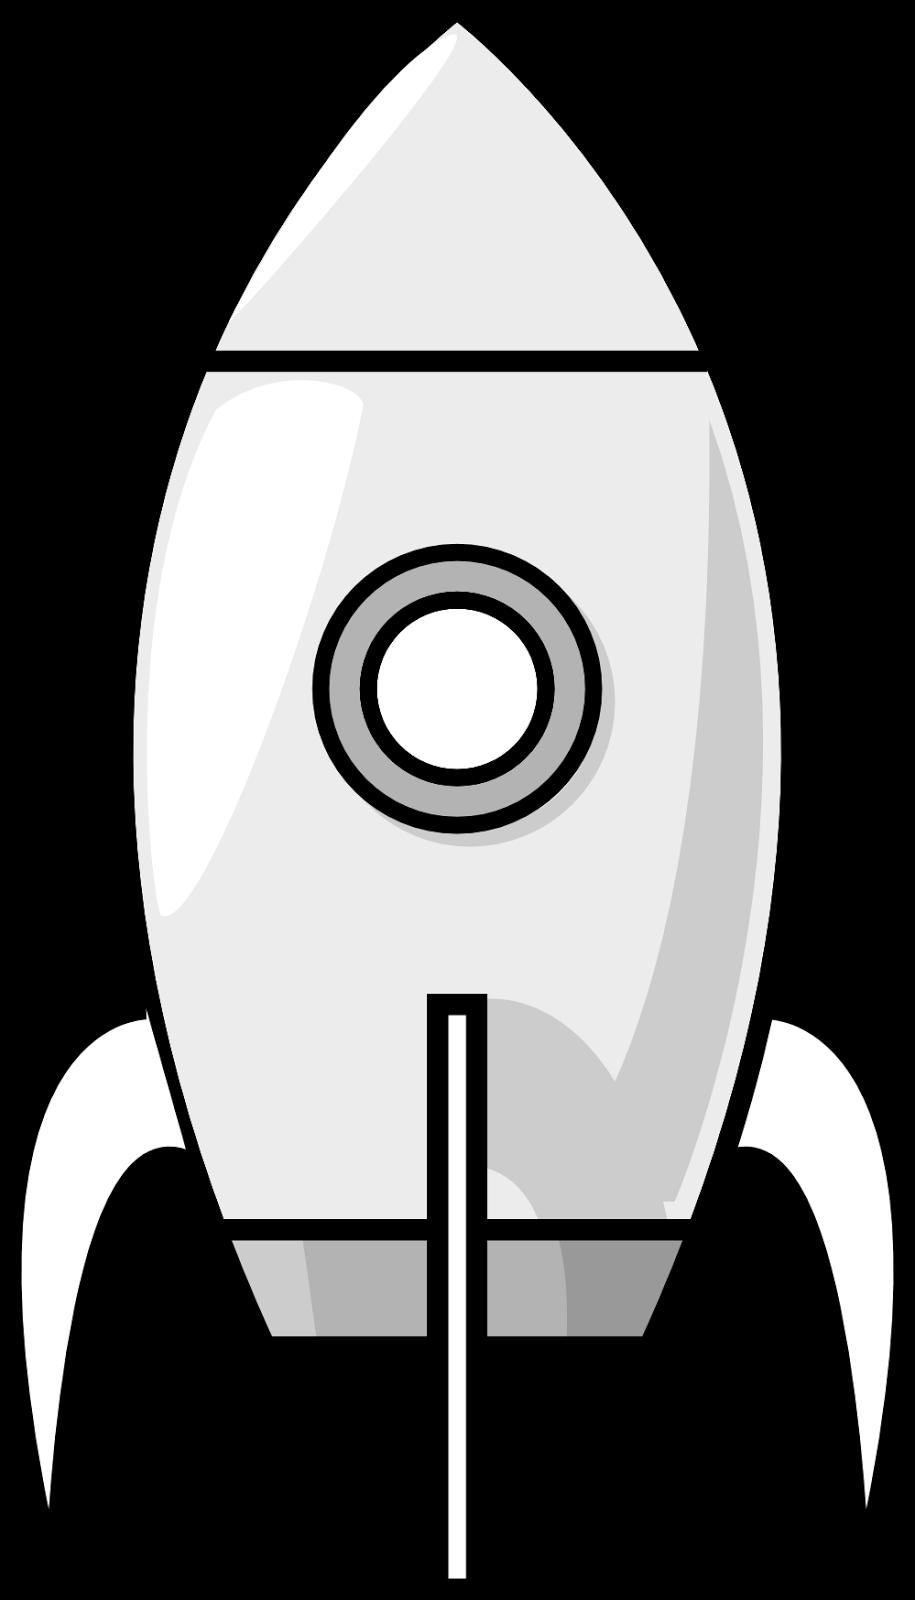 Rocket ship png #30454.